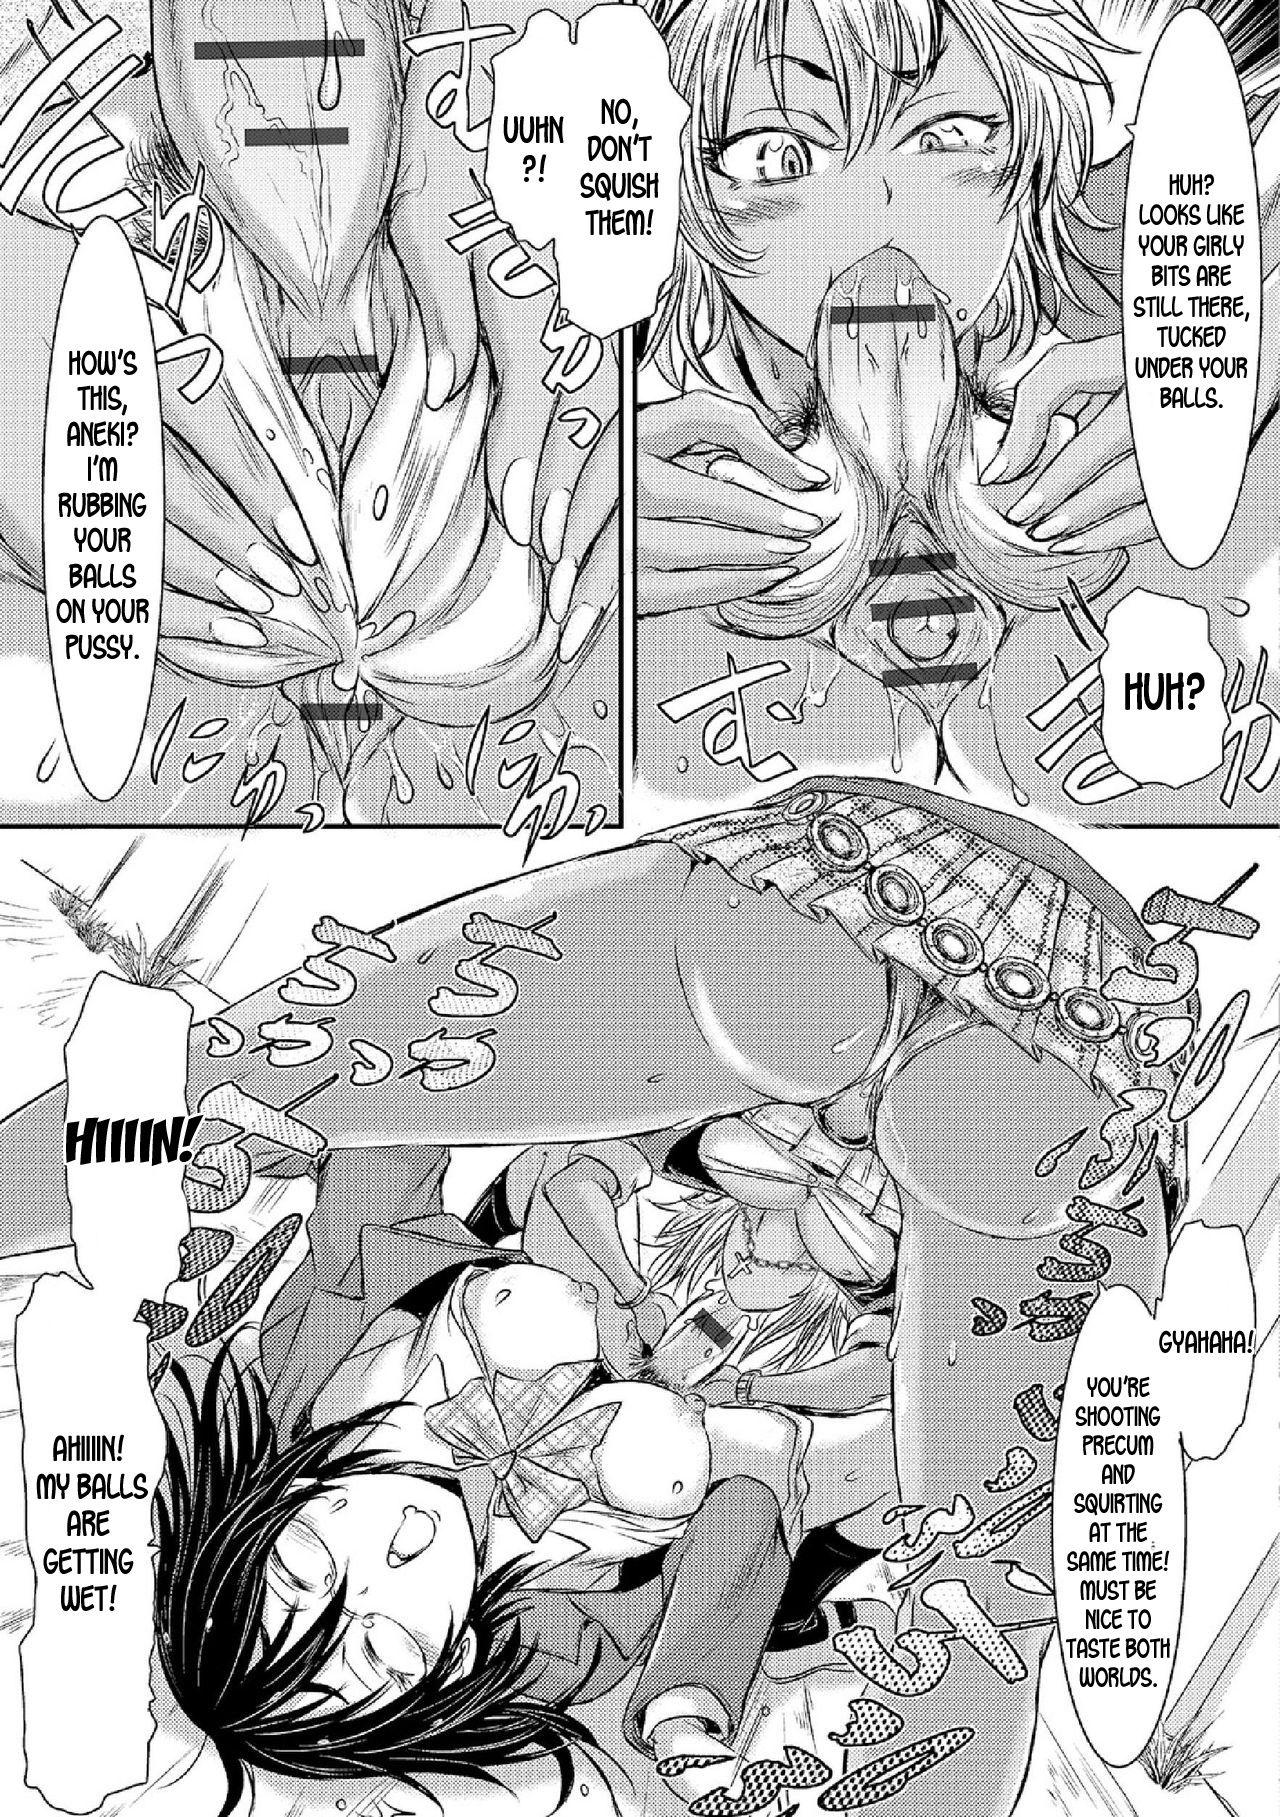 [Ishino Kanon] Onee-chan ga Onii-chan | Onee-chan is Onii-chan (Futanari Secrosse!!) [English] [desudesu] 6